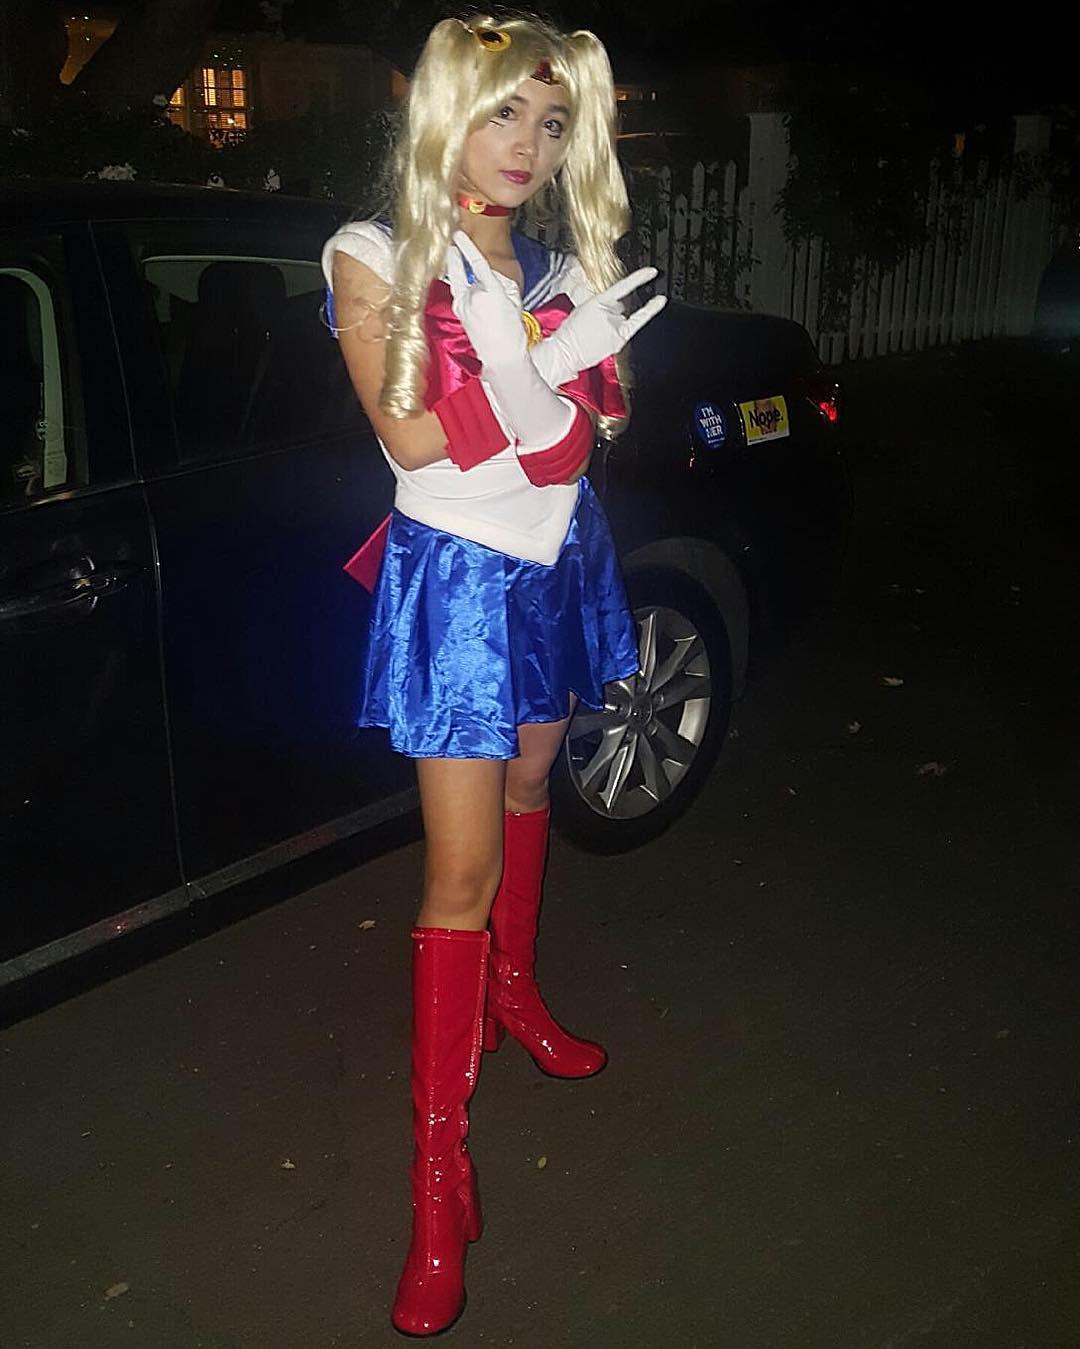 rowan blanchard dressed as sailor moon for halloween